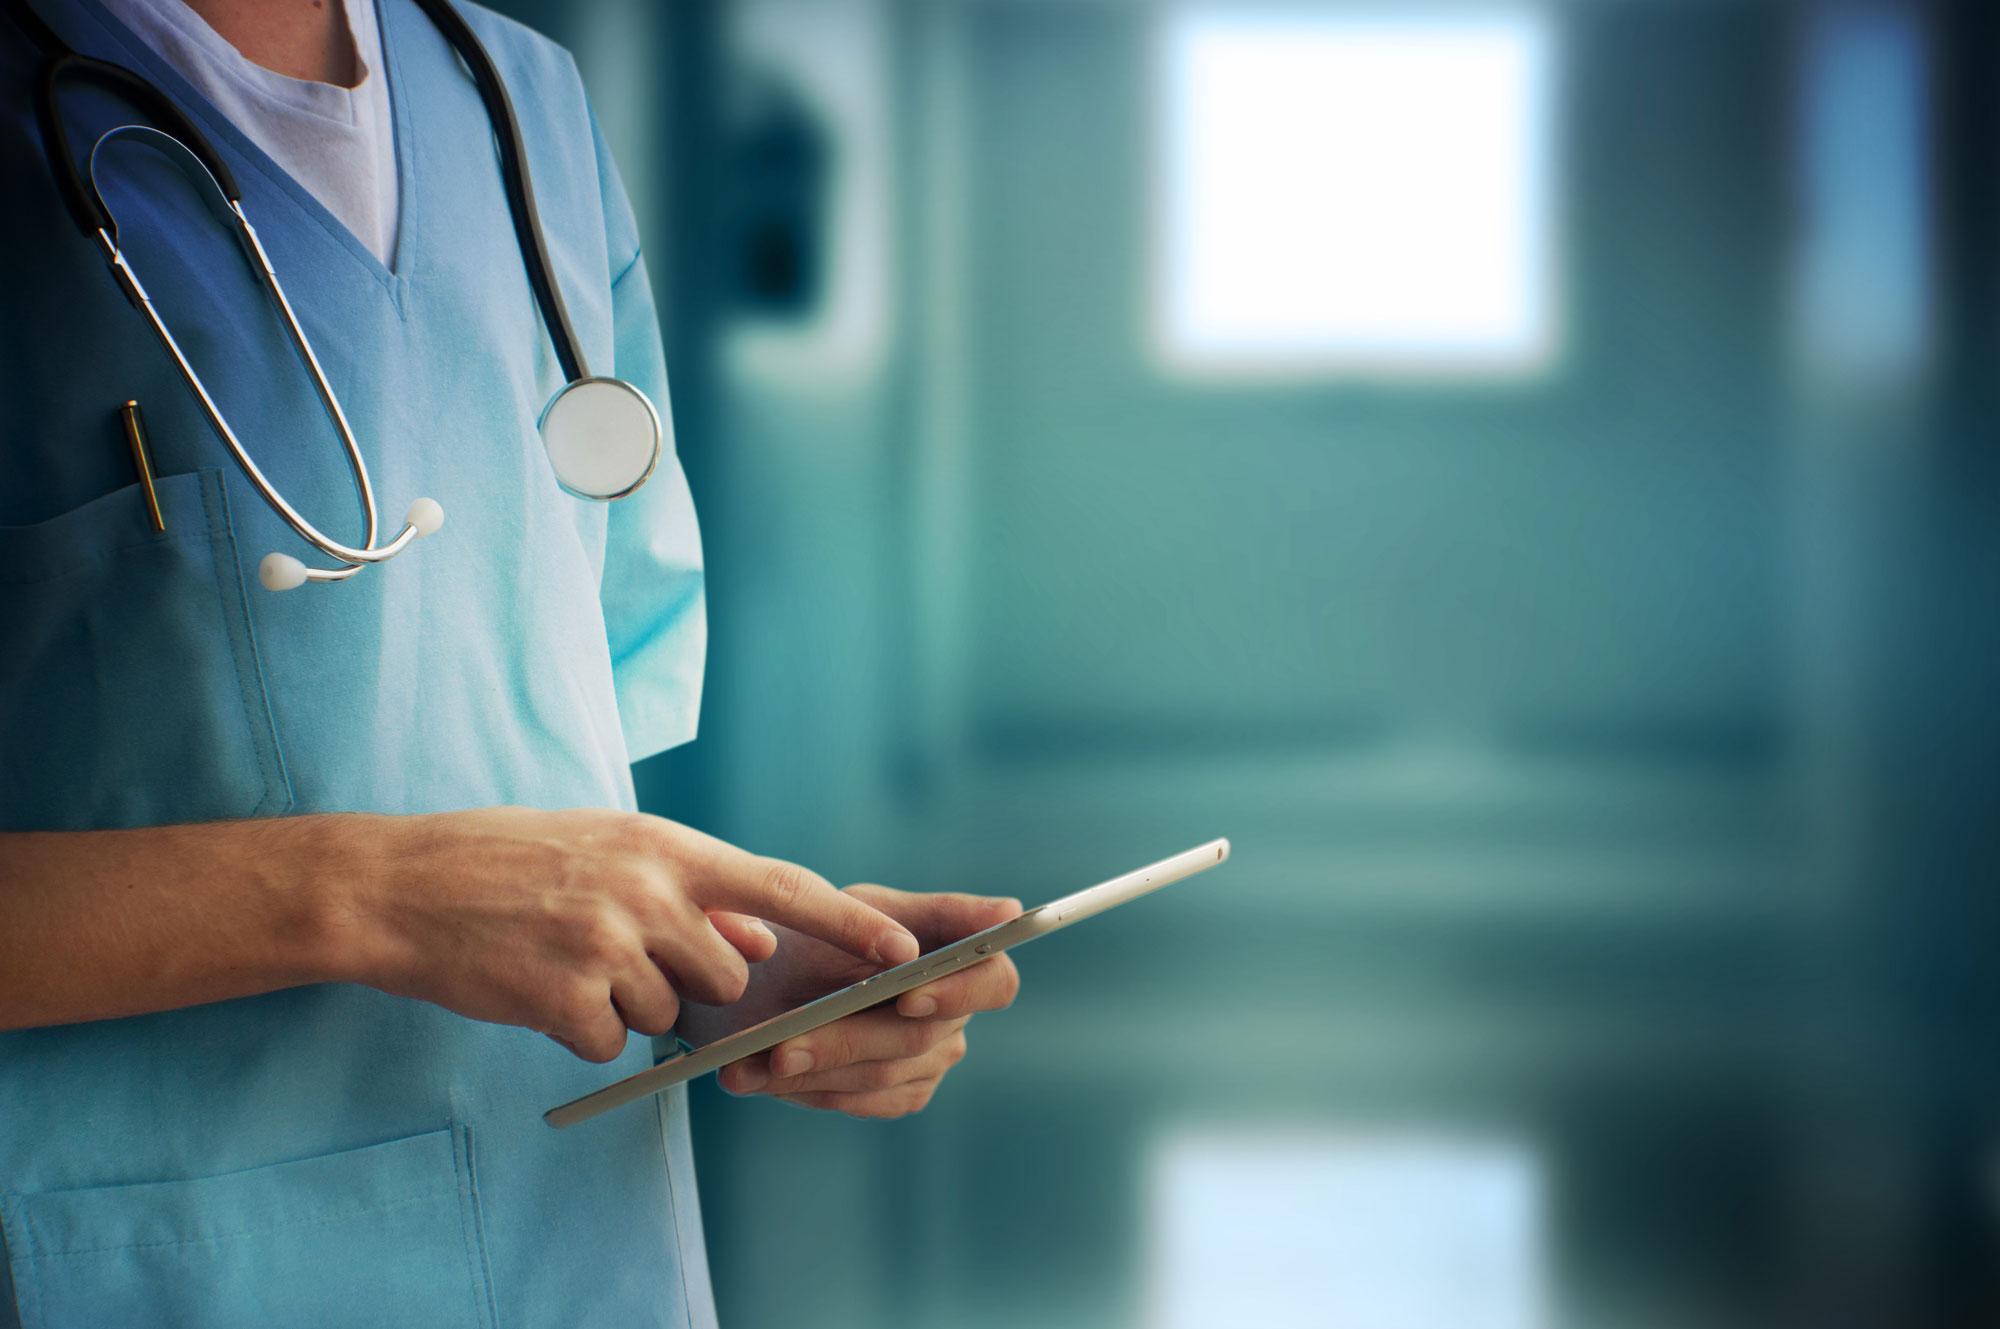 medical doctor using technology - digital health dconnect